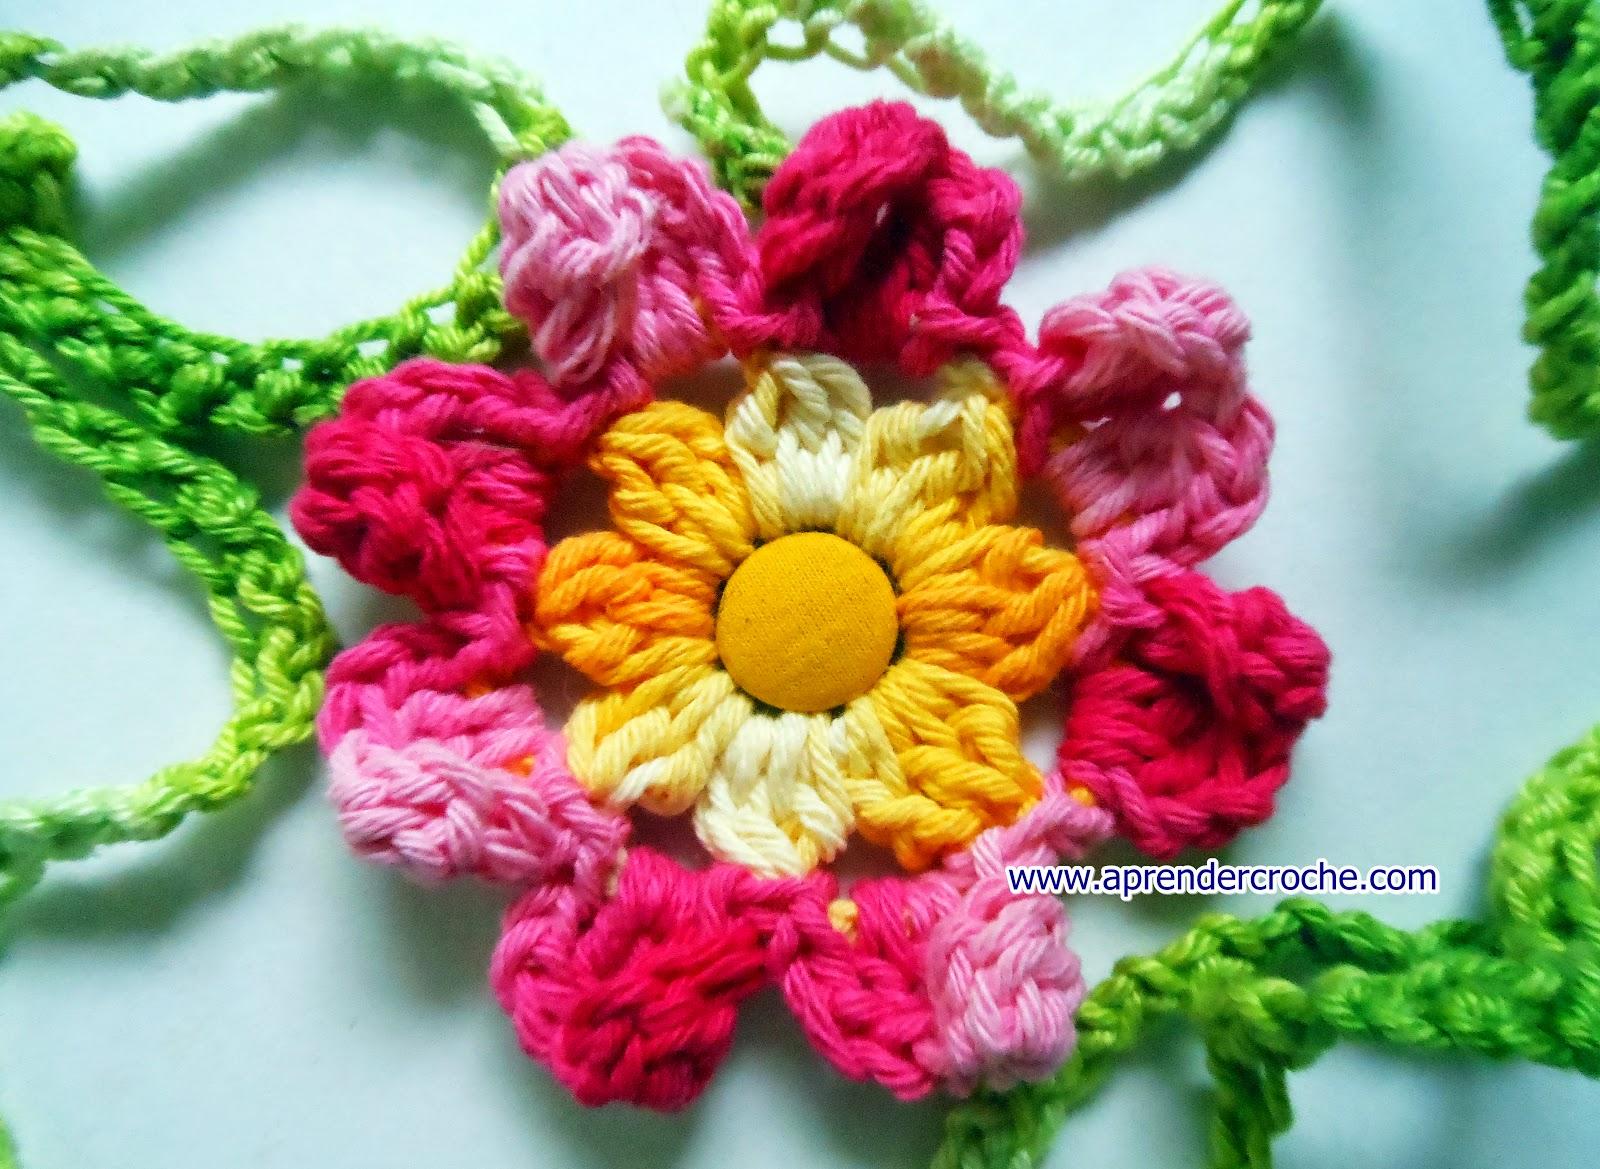 aprender croche mini flores edinir-croche dvd loja frete gratis